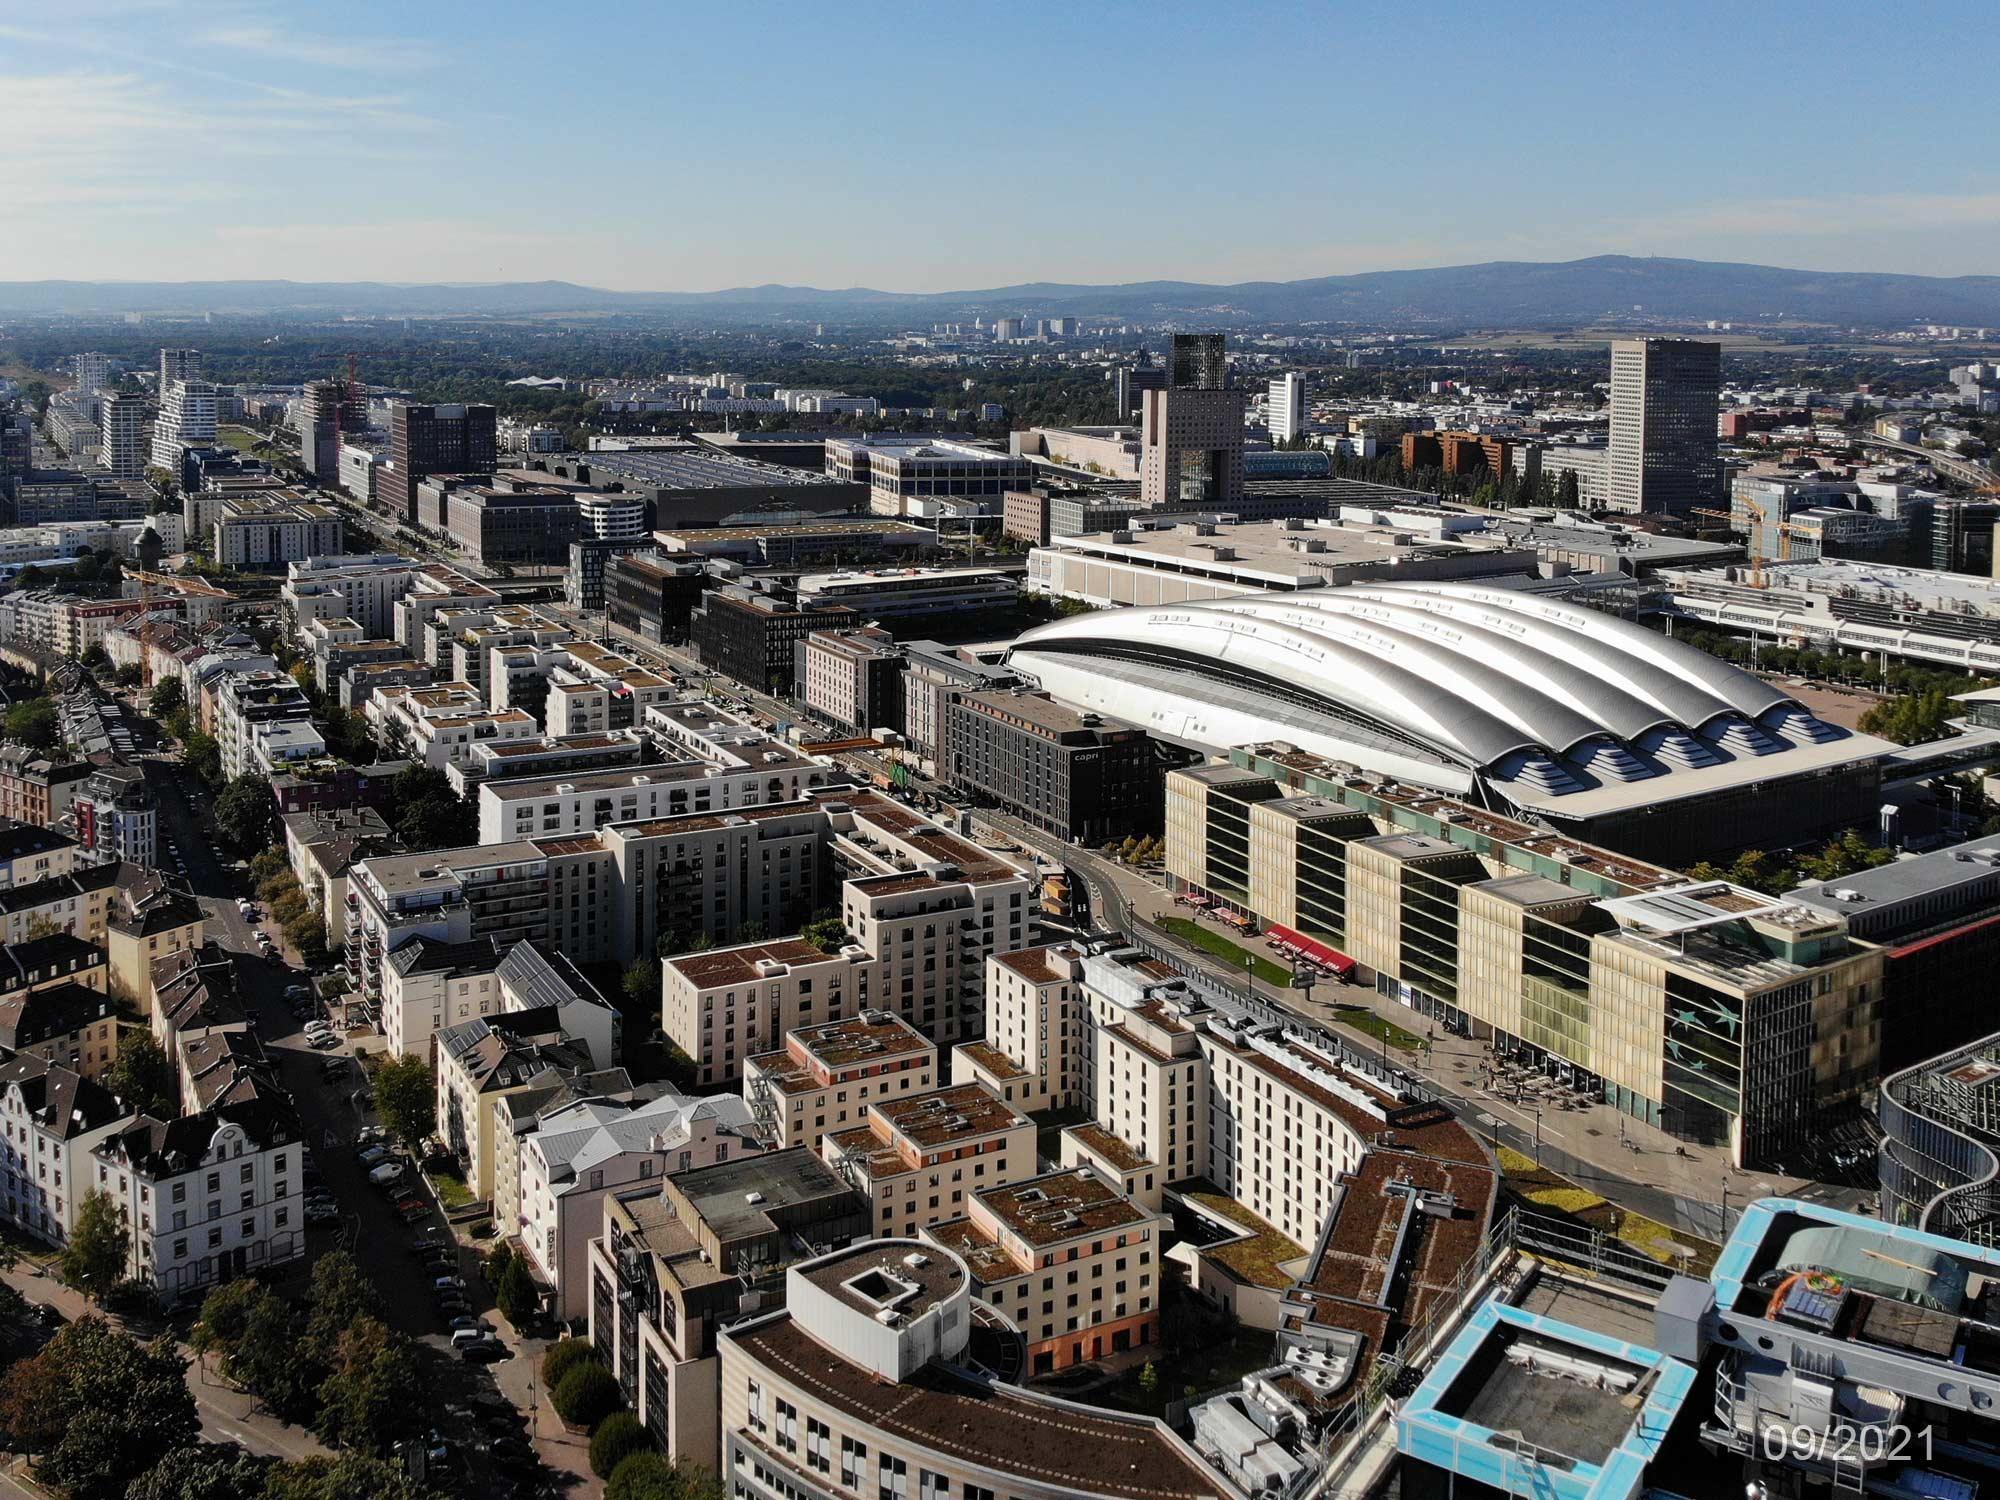 Europa-Allee in Frankfurt am Main - Europaallee FFM - Panorama - Europaviertel - September 2021